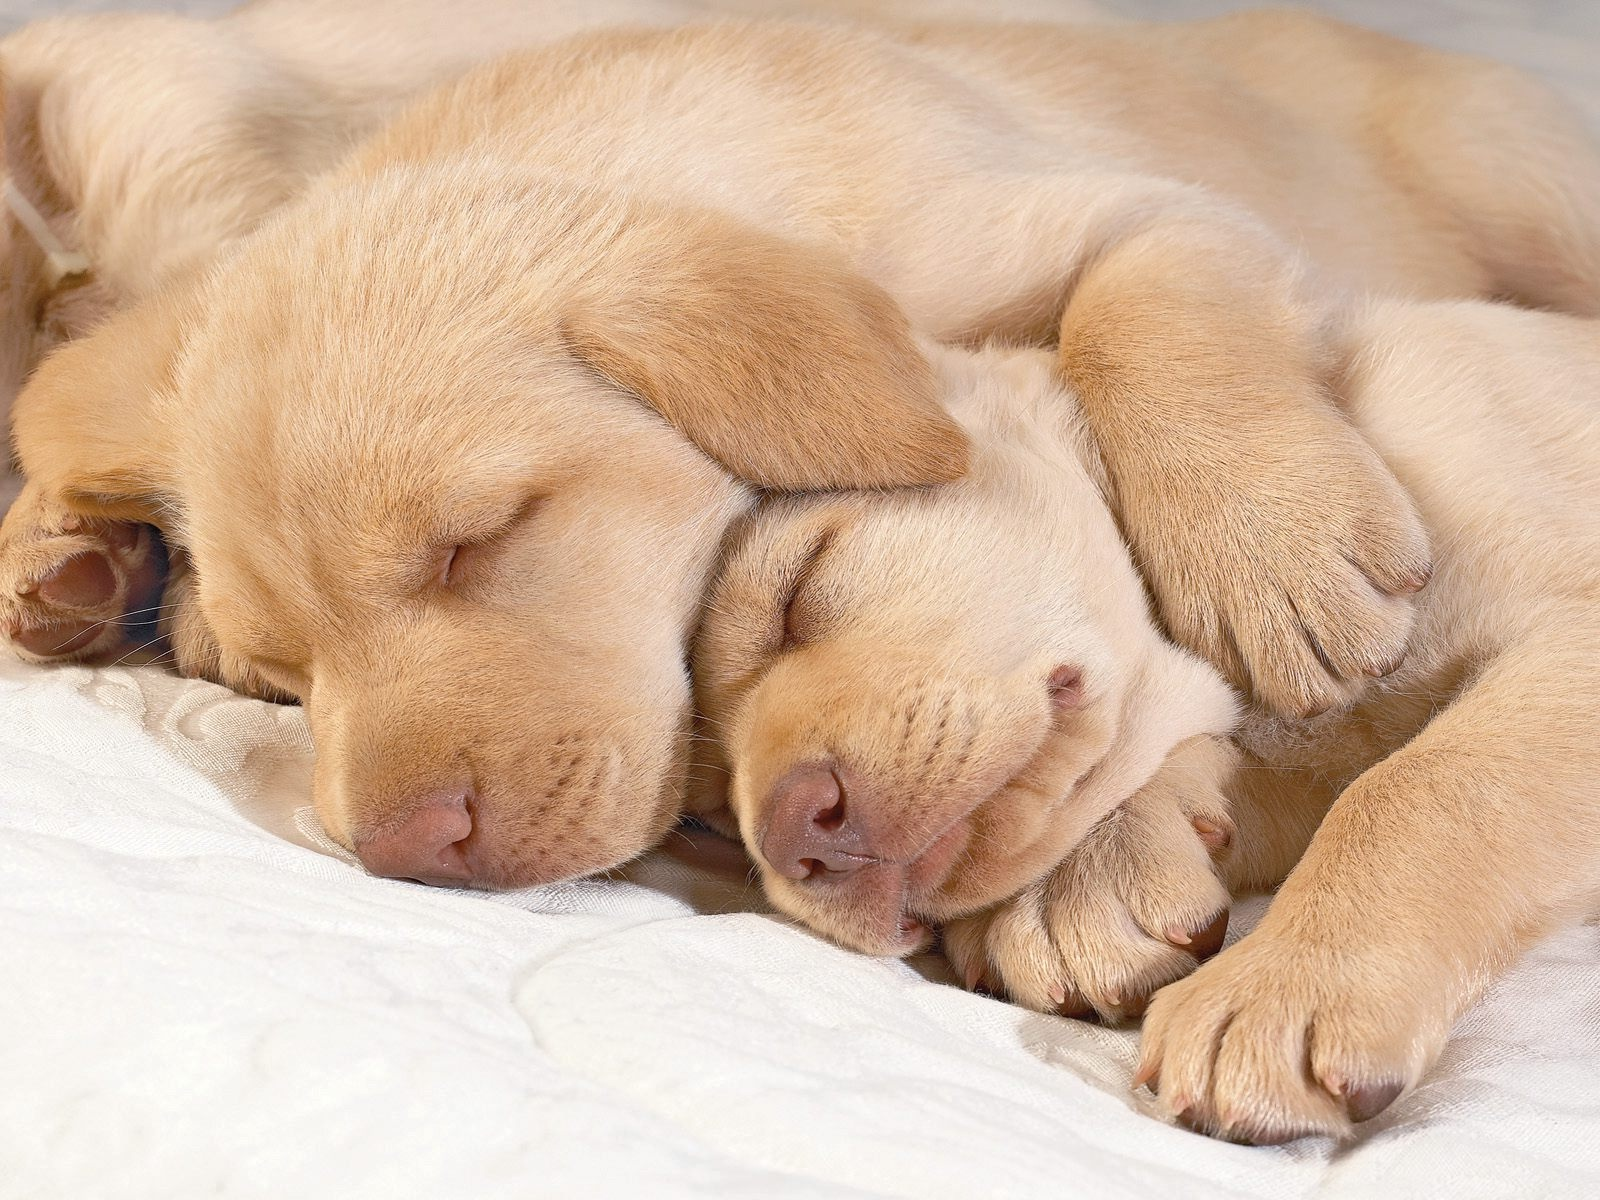 Sleeping Golden Retriever Puppies Photo